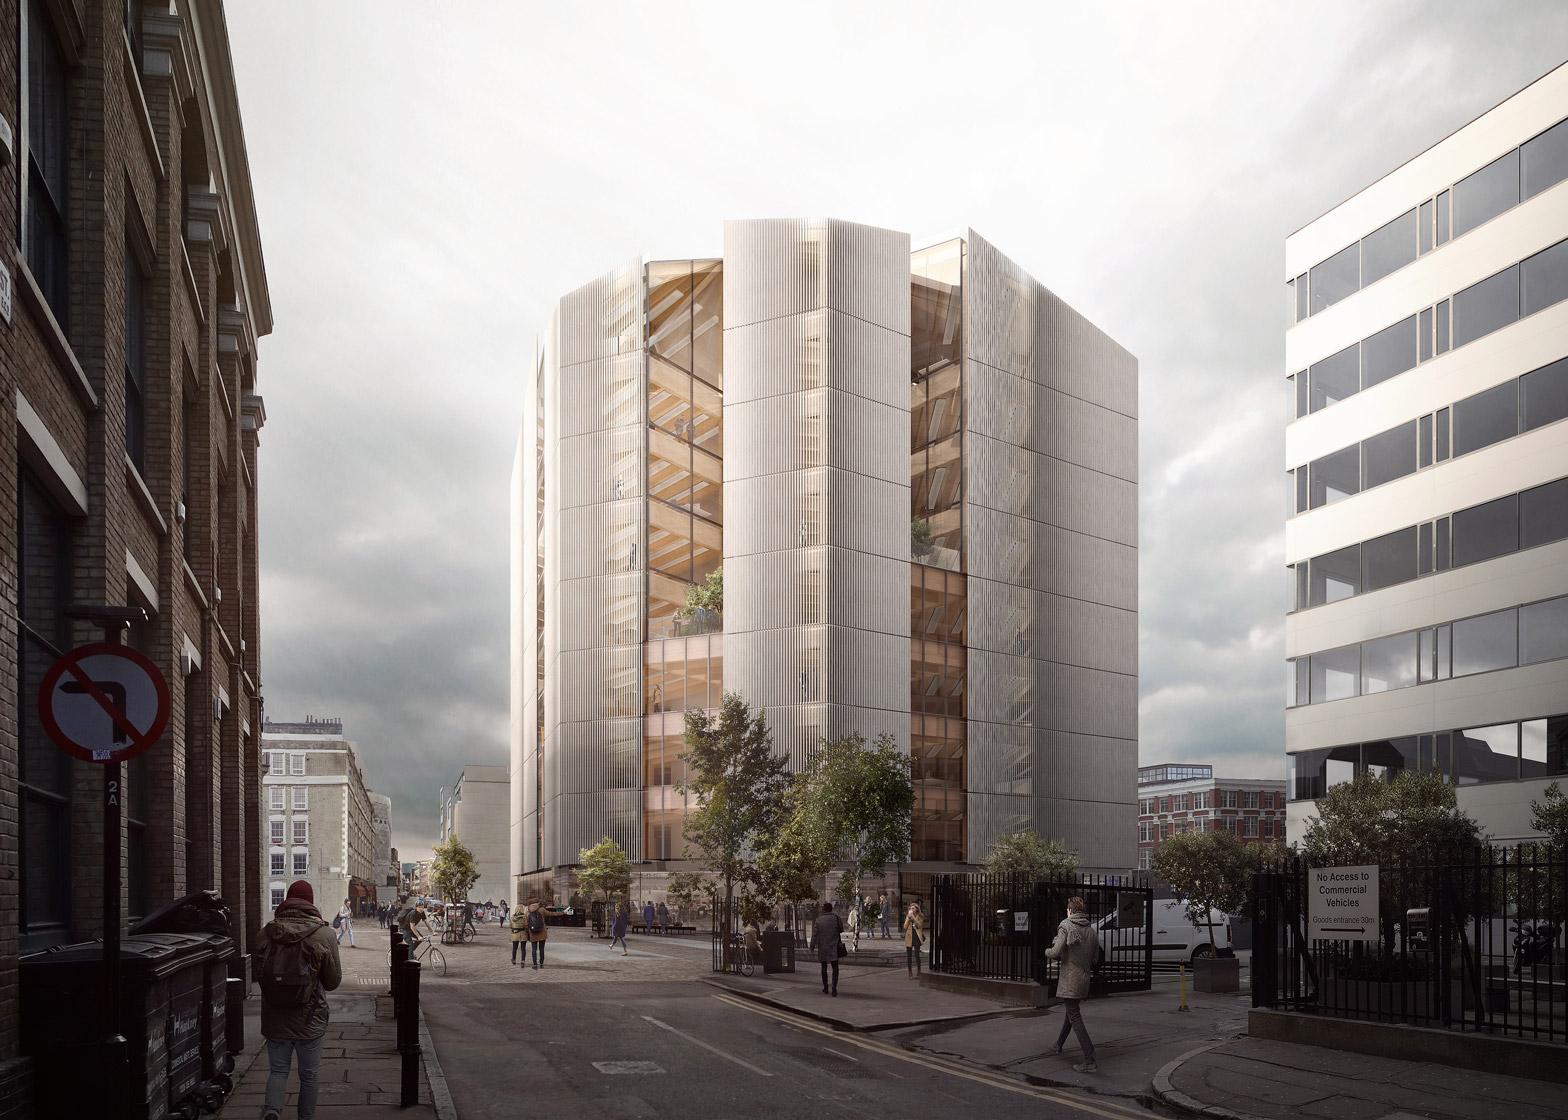 Development House by Waugh Thistleton